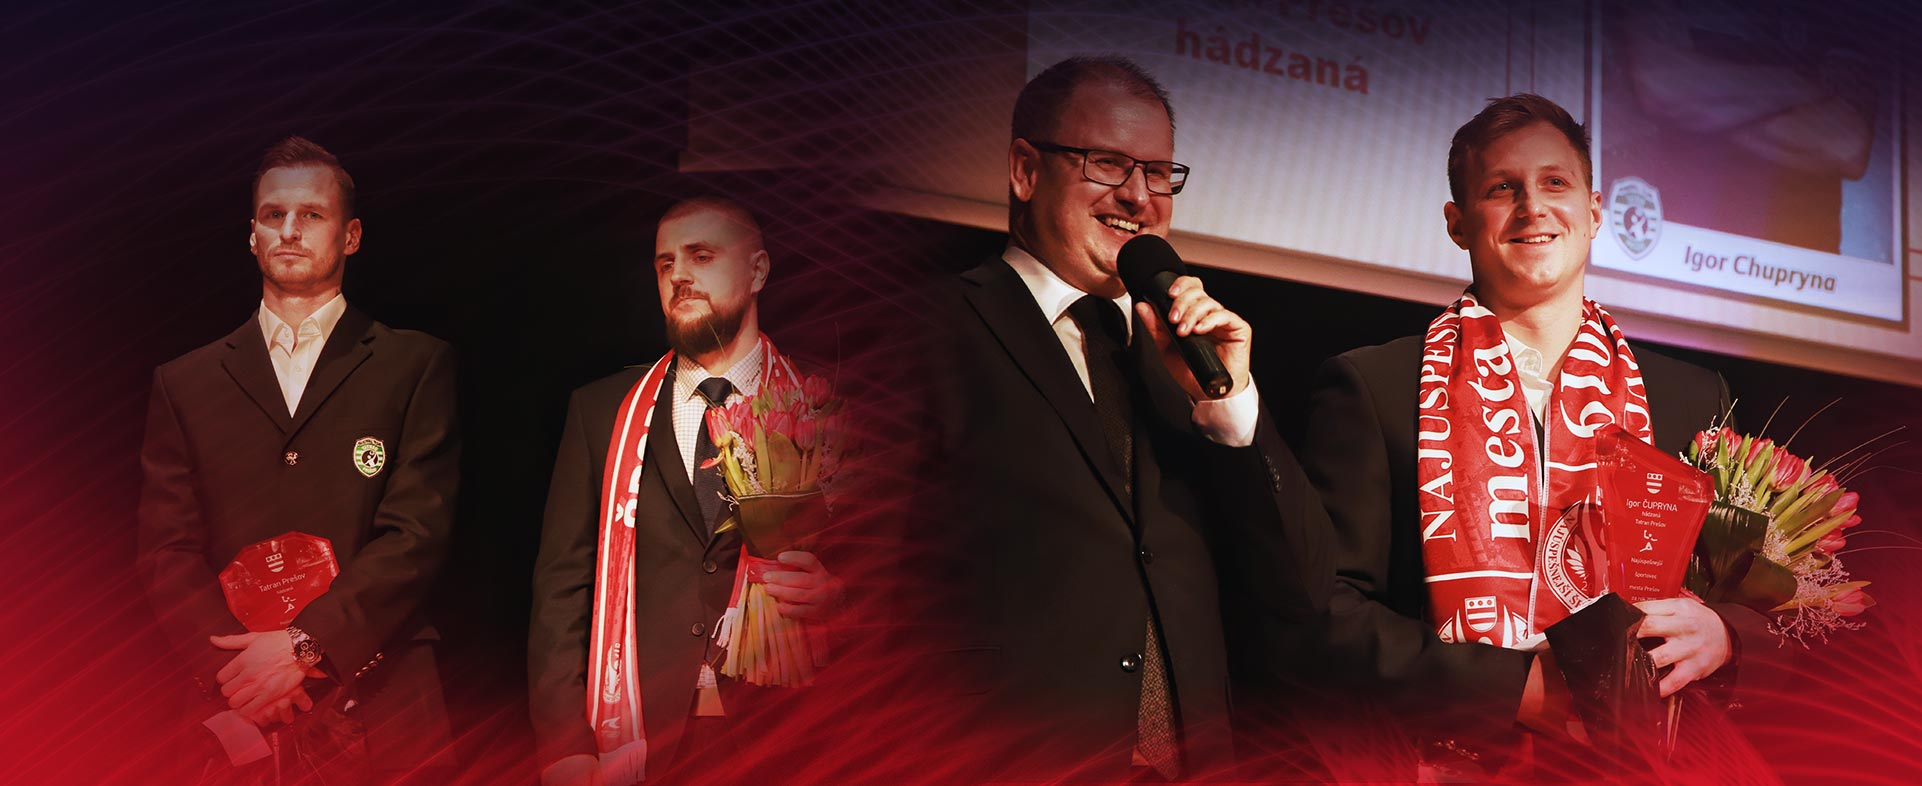 Športovec Prešova 2019